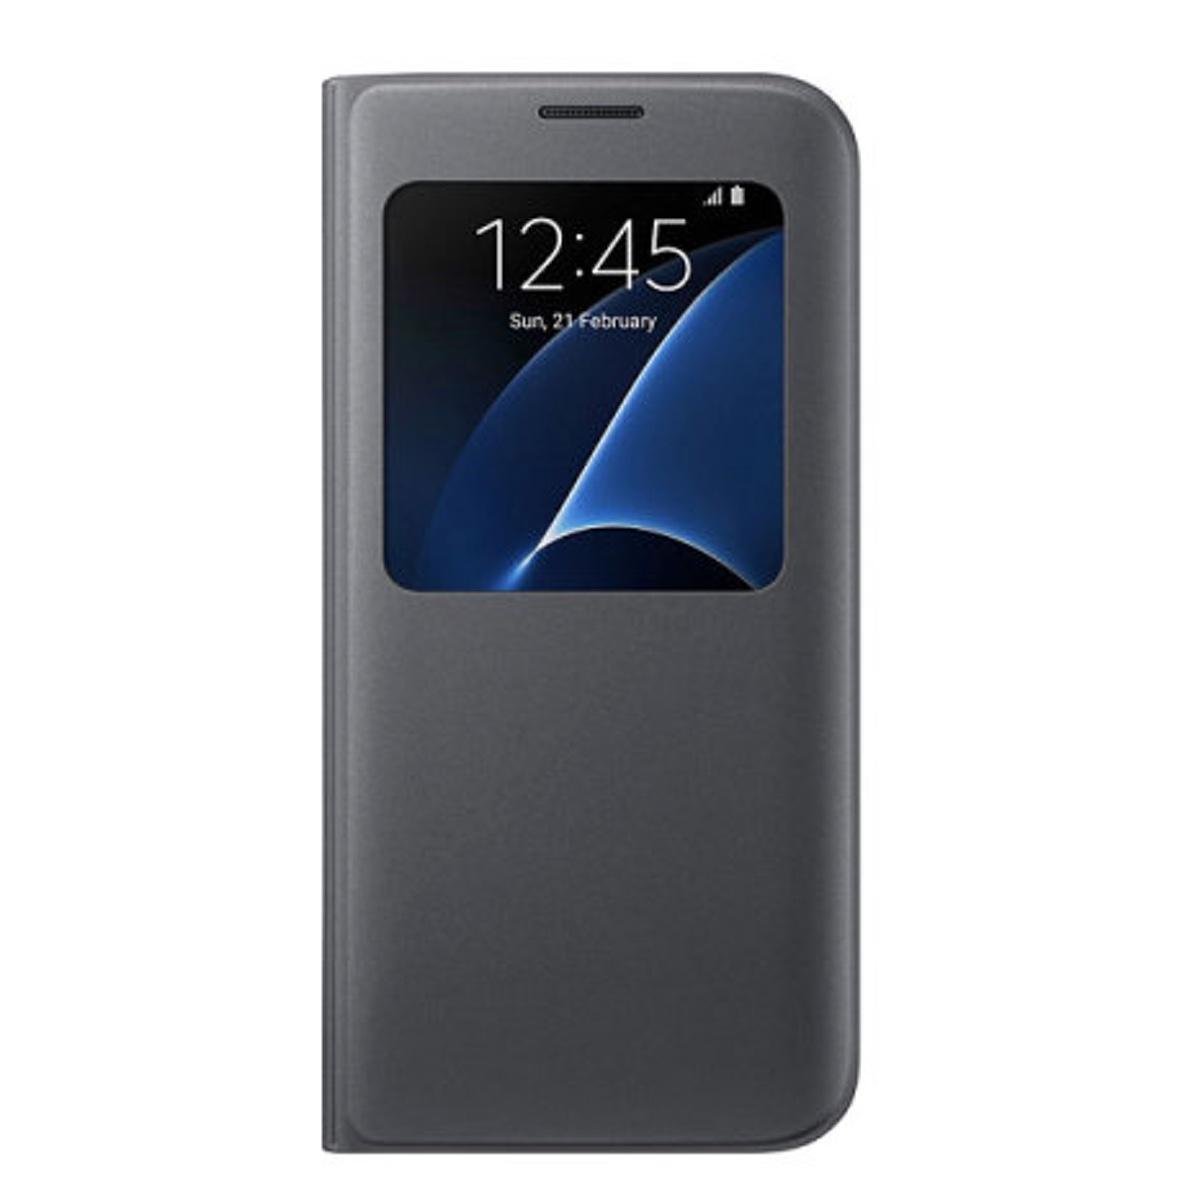 Pouzdro S-View pro Samsung Galaxy S7 Edge G935 (EU Blister) černé EF-CG935PBE